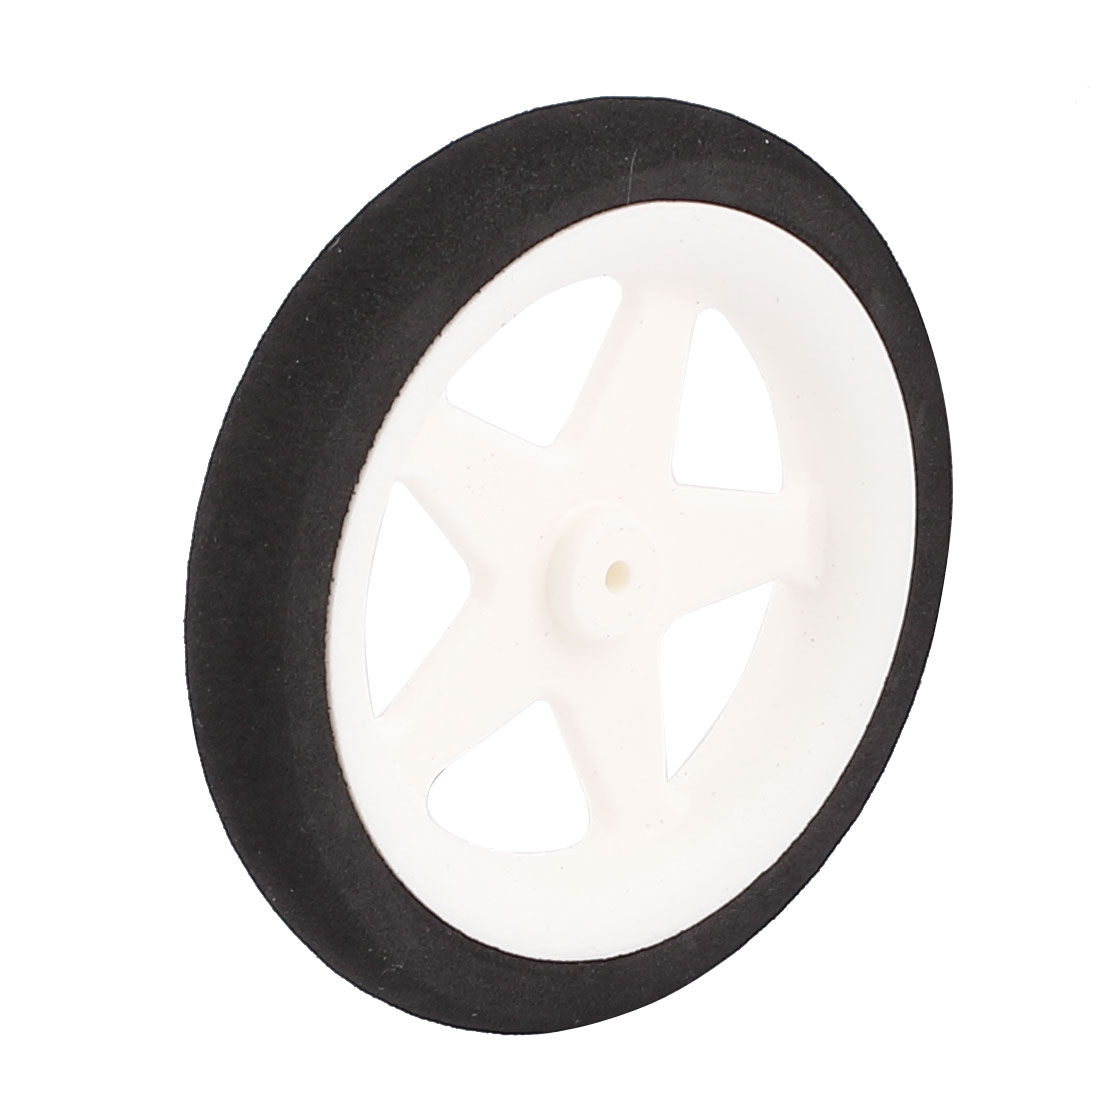 1.8mm Shaft Hole RC Plane Tail Tire Lightweight Sponge Wheel Metric Size D55 H10